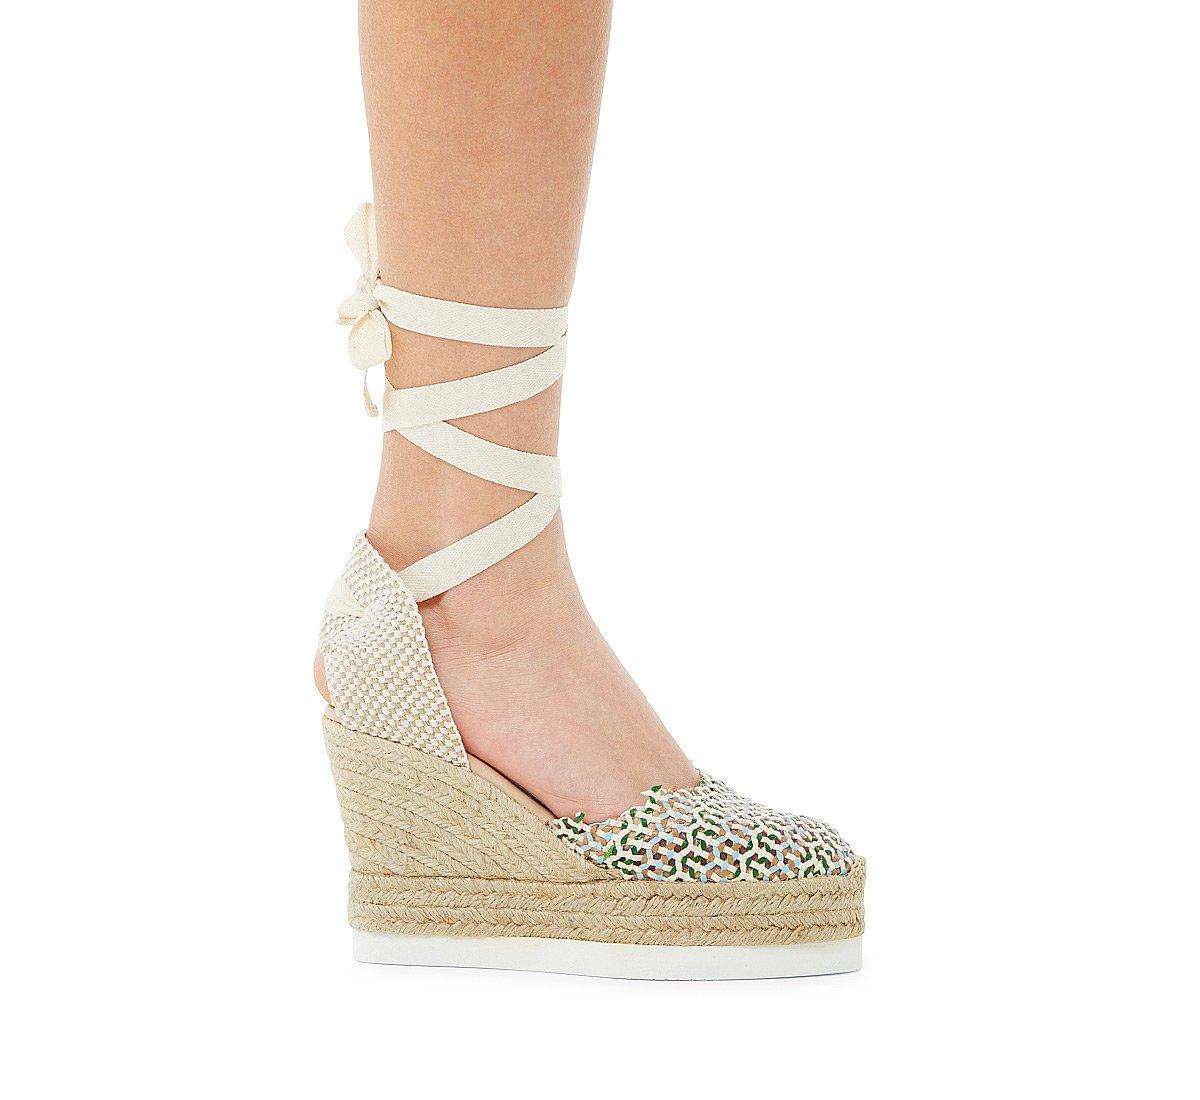 Sandalo in pelle intrecciata